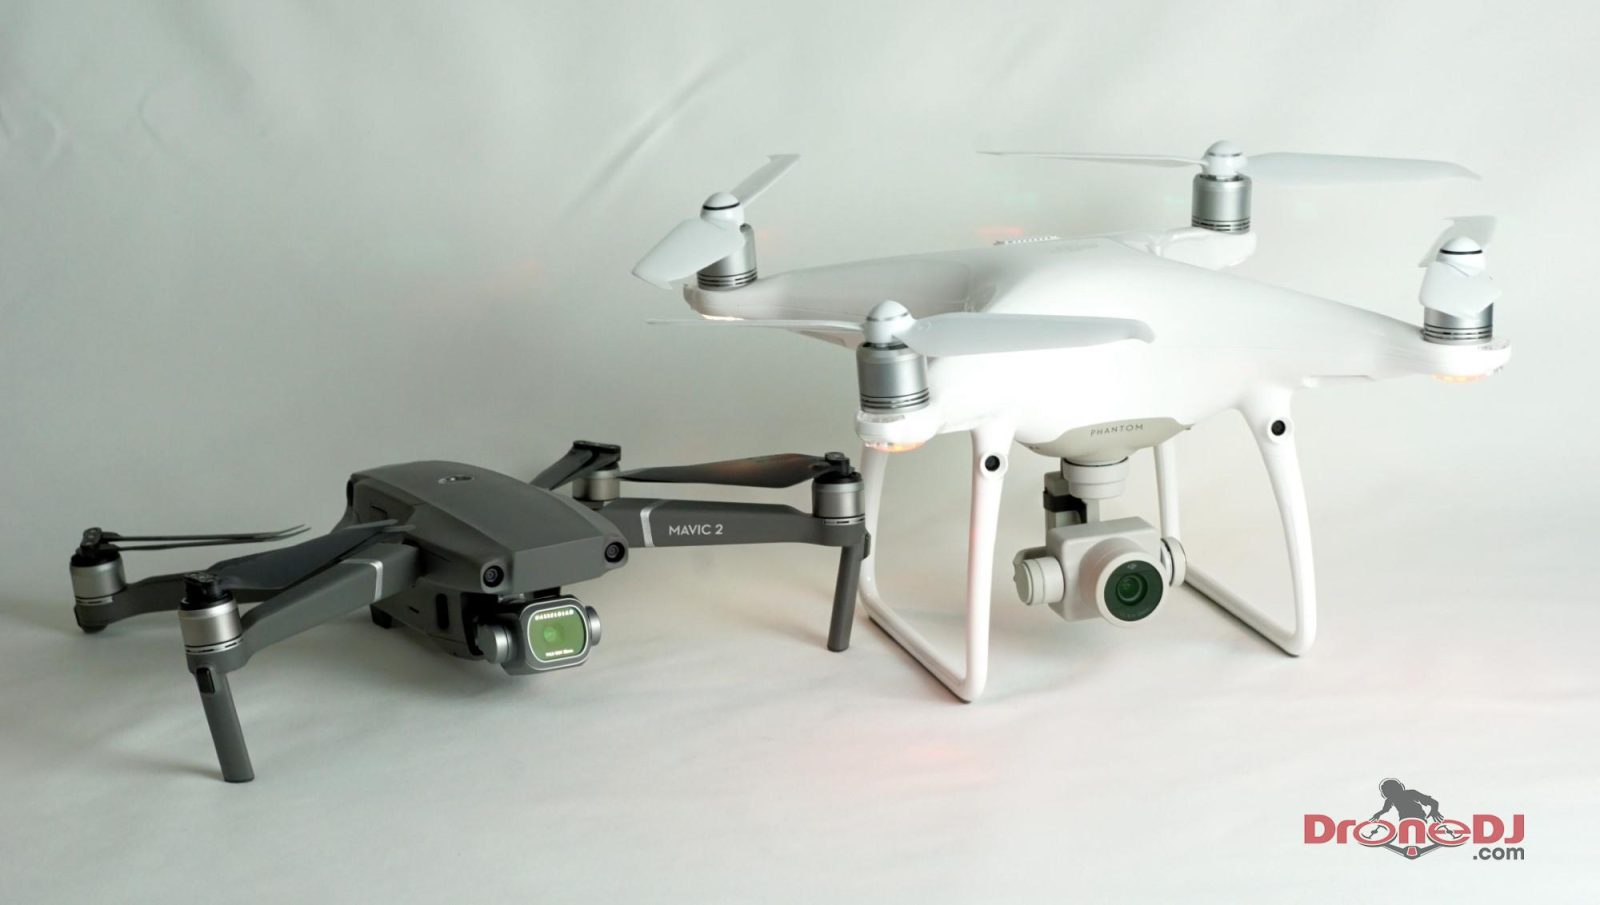 Mavic 2 Pro vs  Phantom 4 Pro - read this before buying - DroneDJ